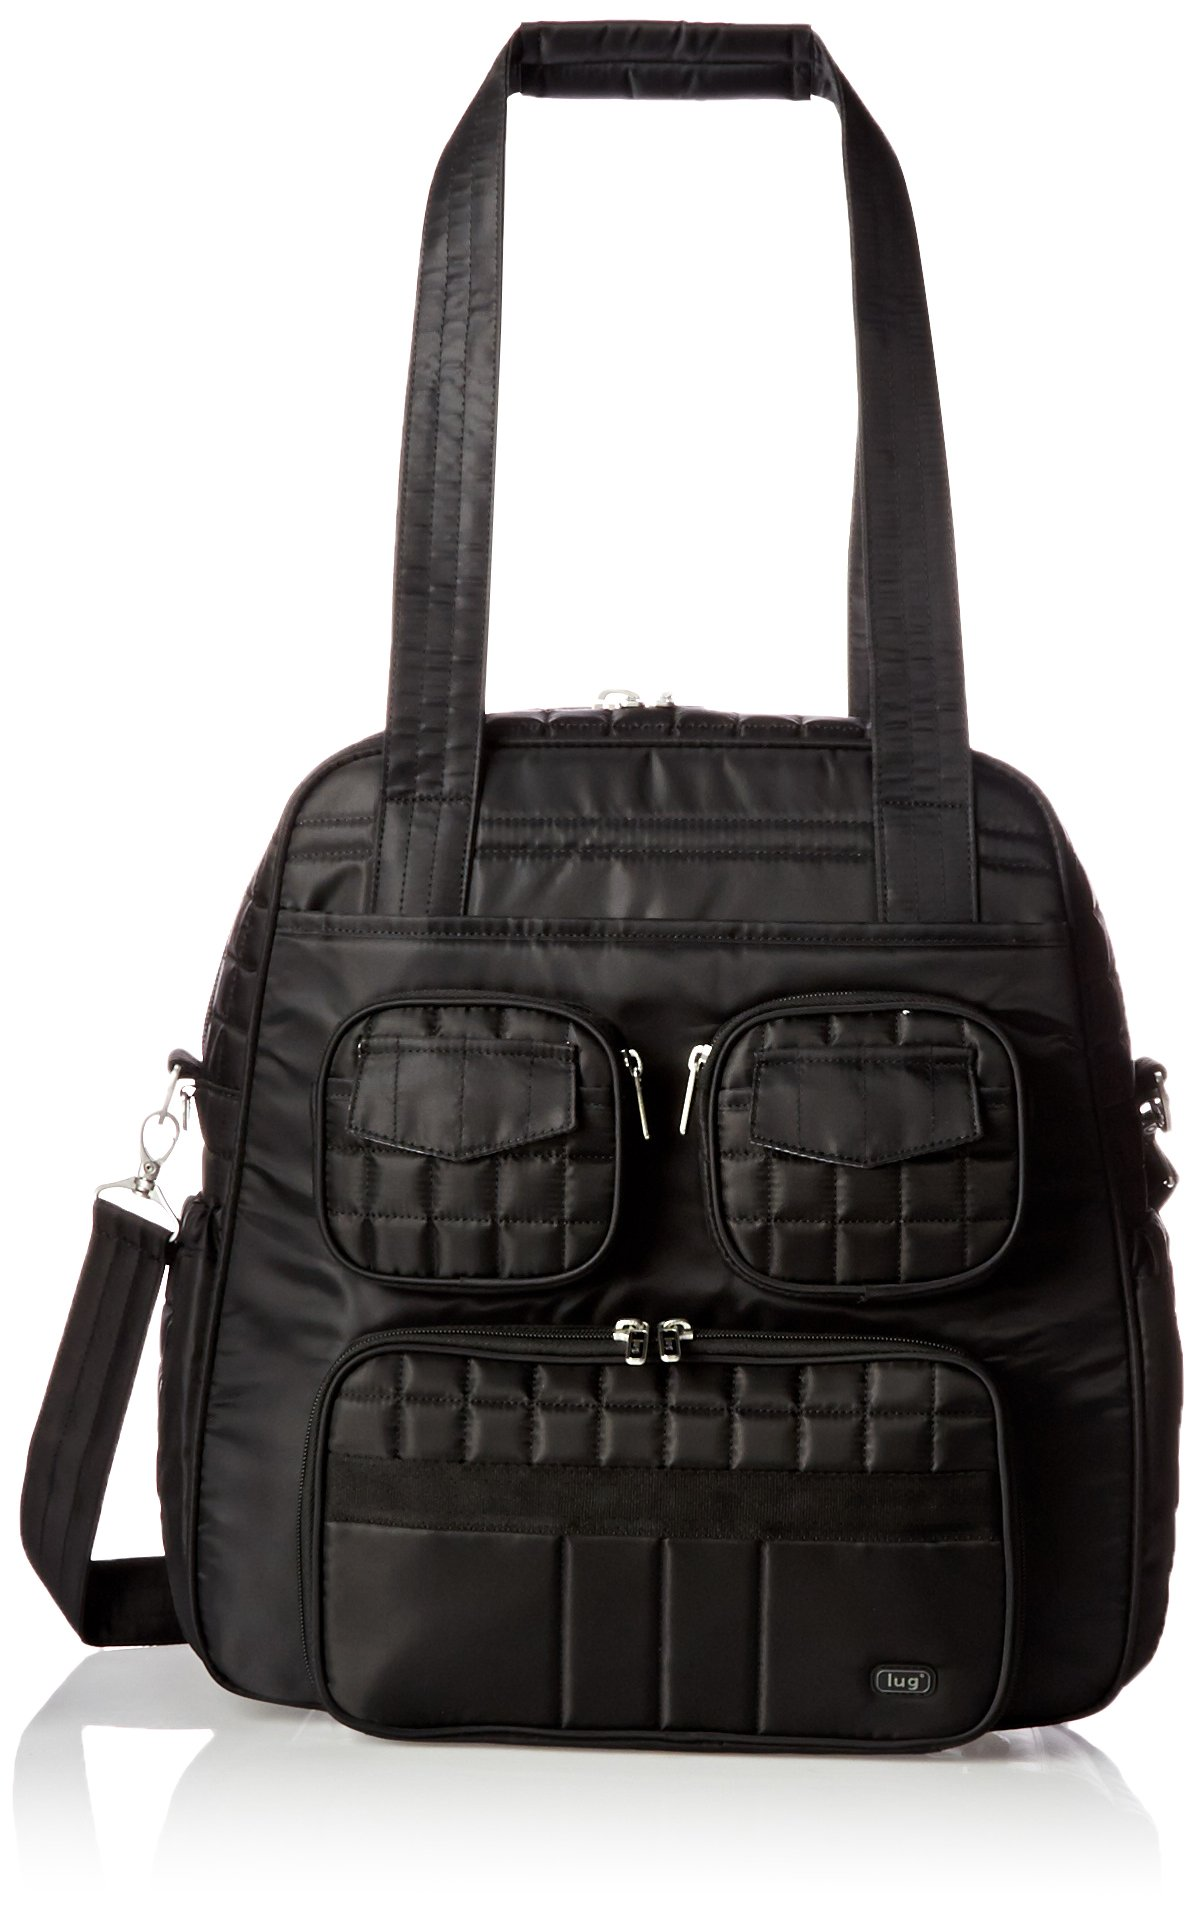 Lug Puddle Jumper Overnight/Gym Bag, Midnight Black by Lug (Image #1)